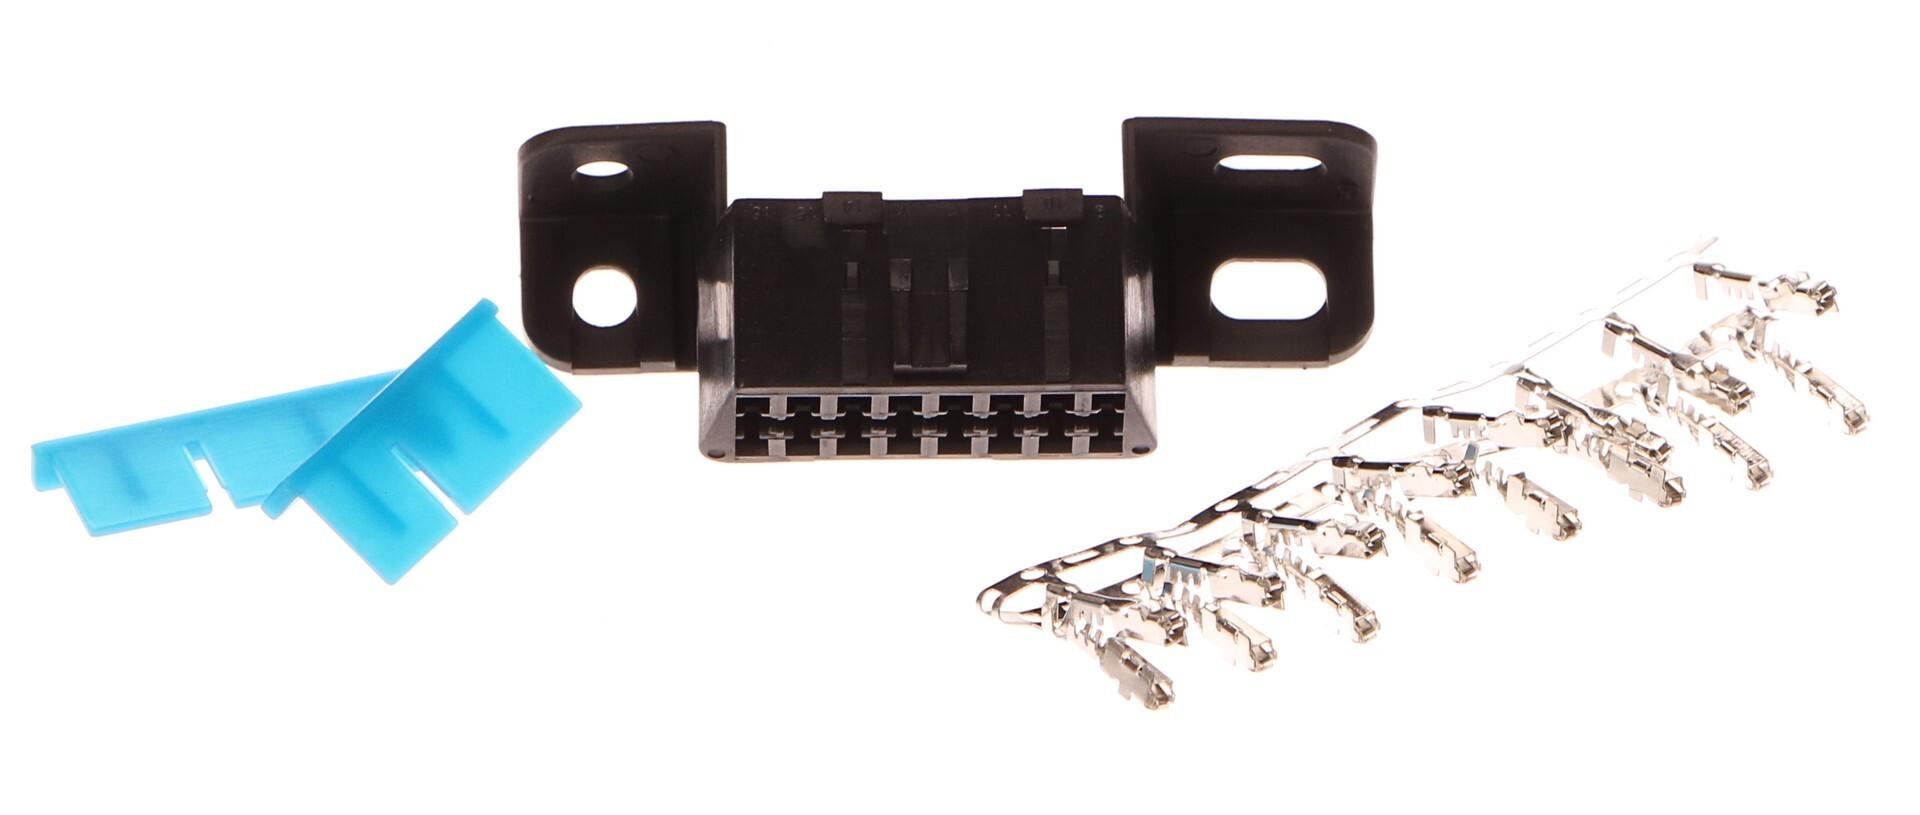 Zásuvka OBD2 - samička bez zapojených pinů, 16 volných pinů - SIXTOL